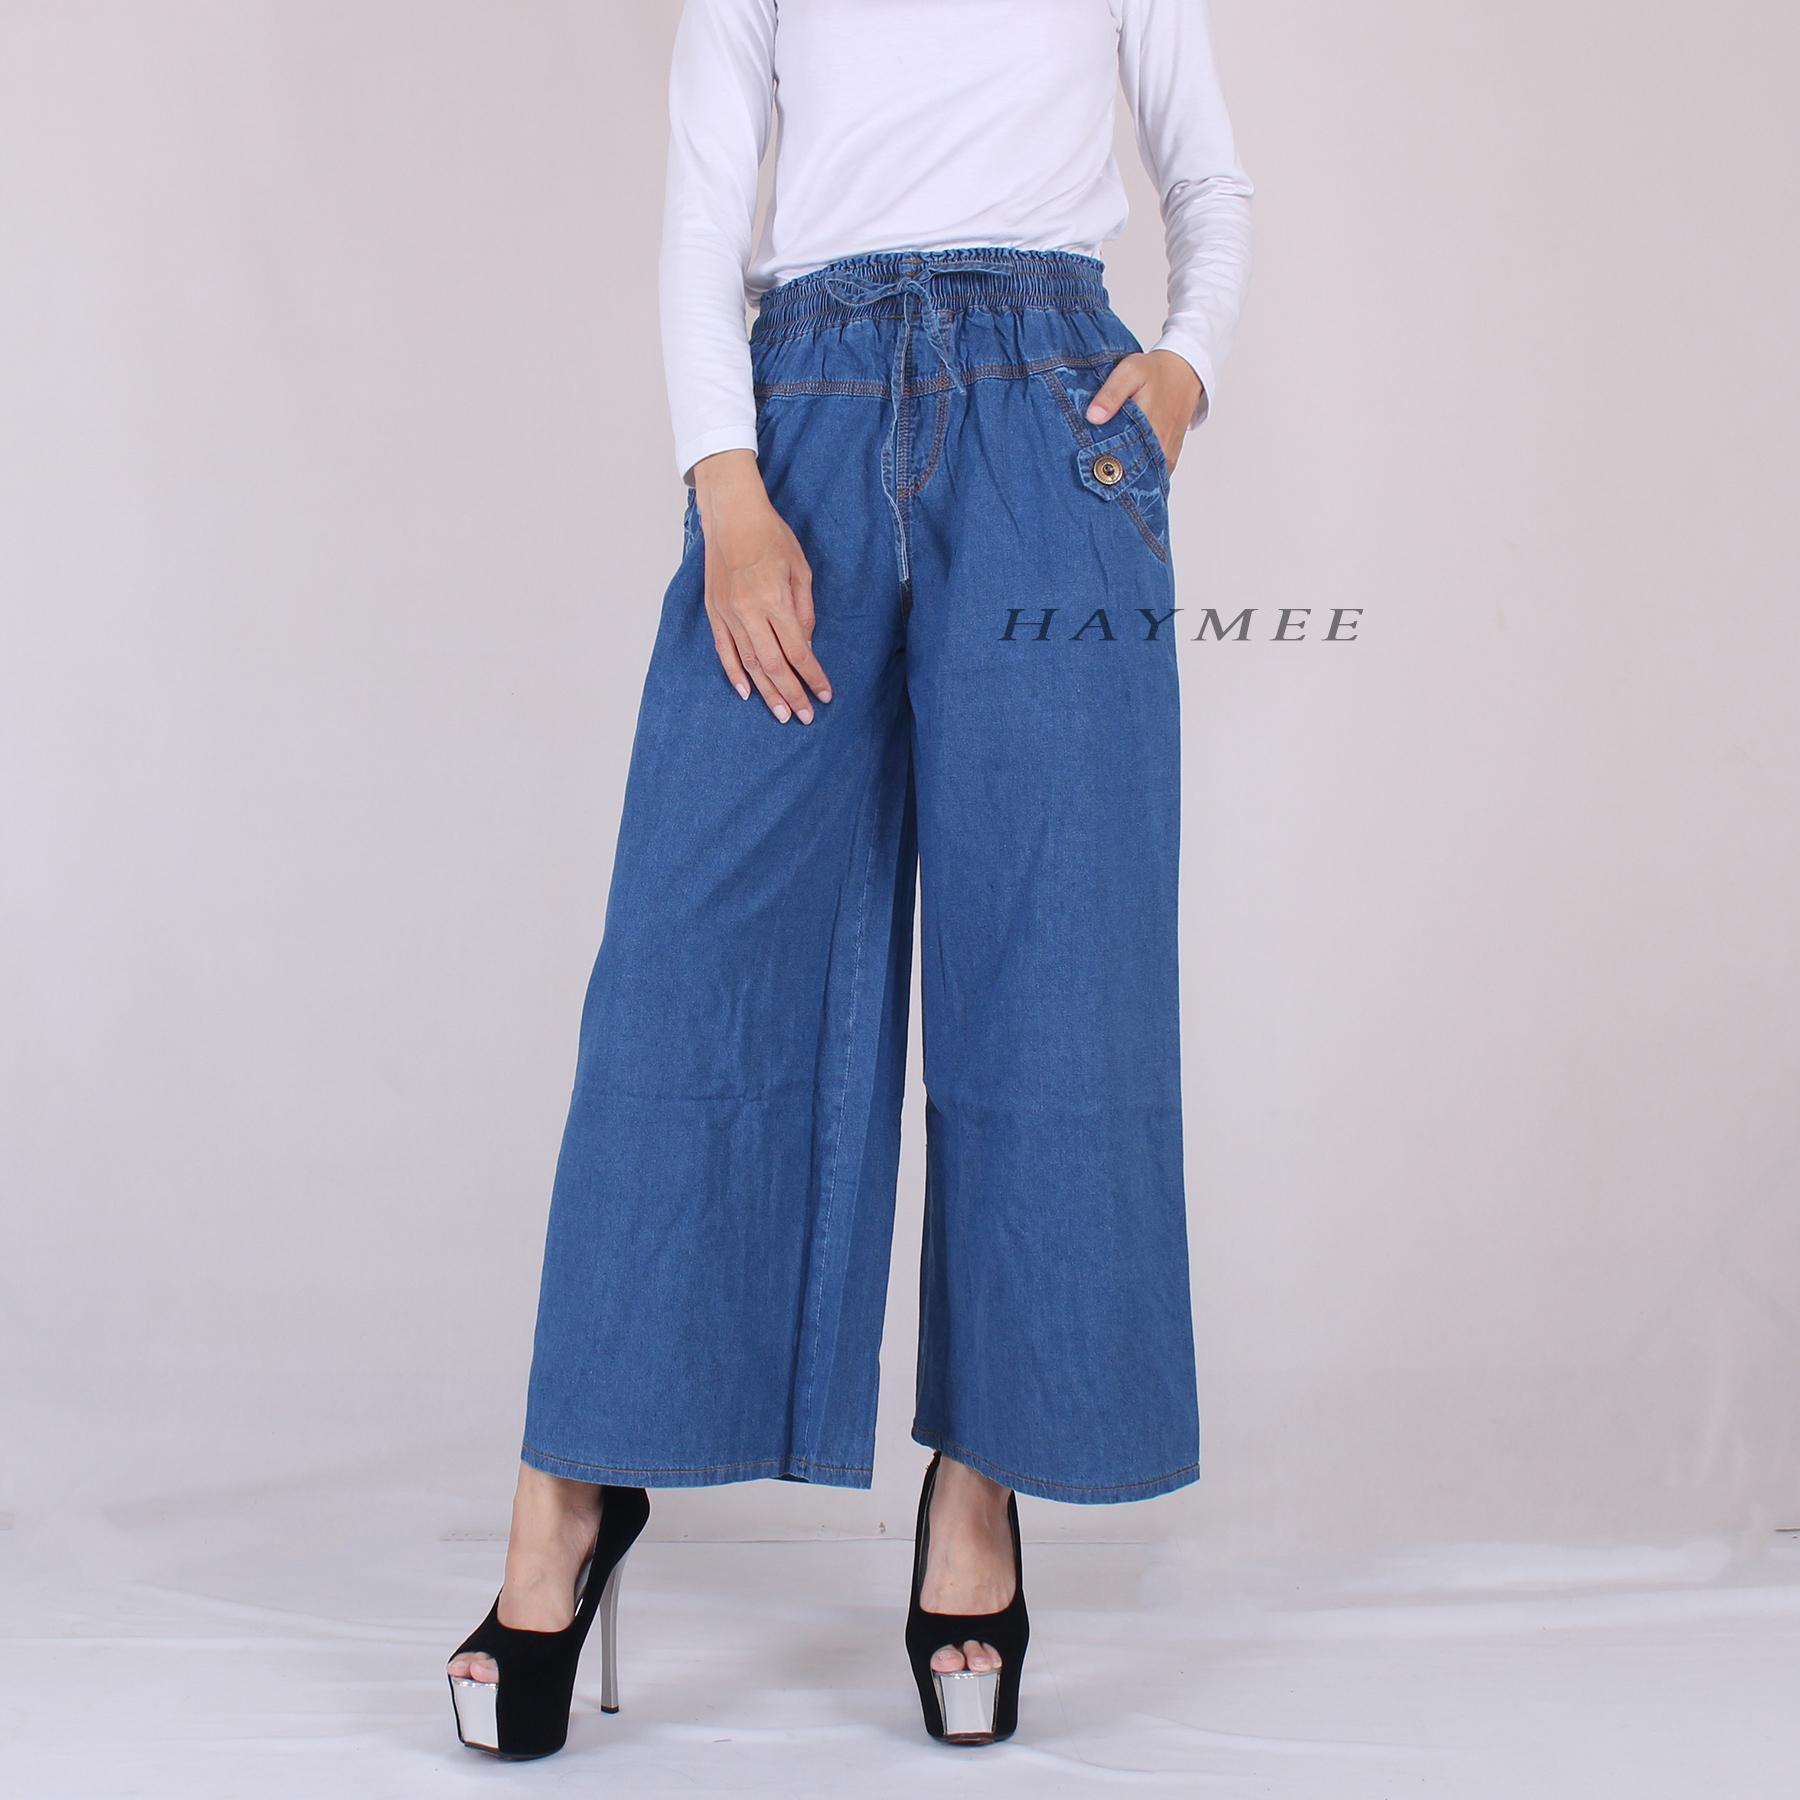 HaymeeStore Celana Kulot Jeans Denim Panjang Wanita Celana Cullot Denim Cewek Bawahan Cewe Pakaian Kantor Casual Fashion